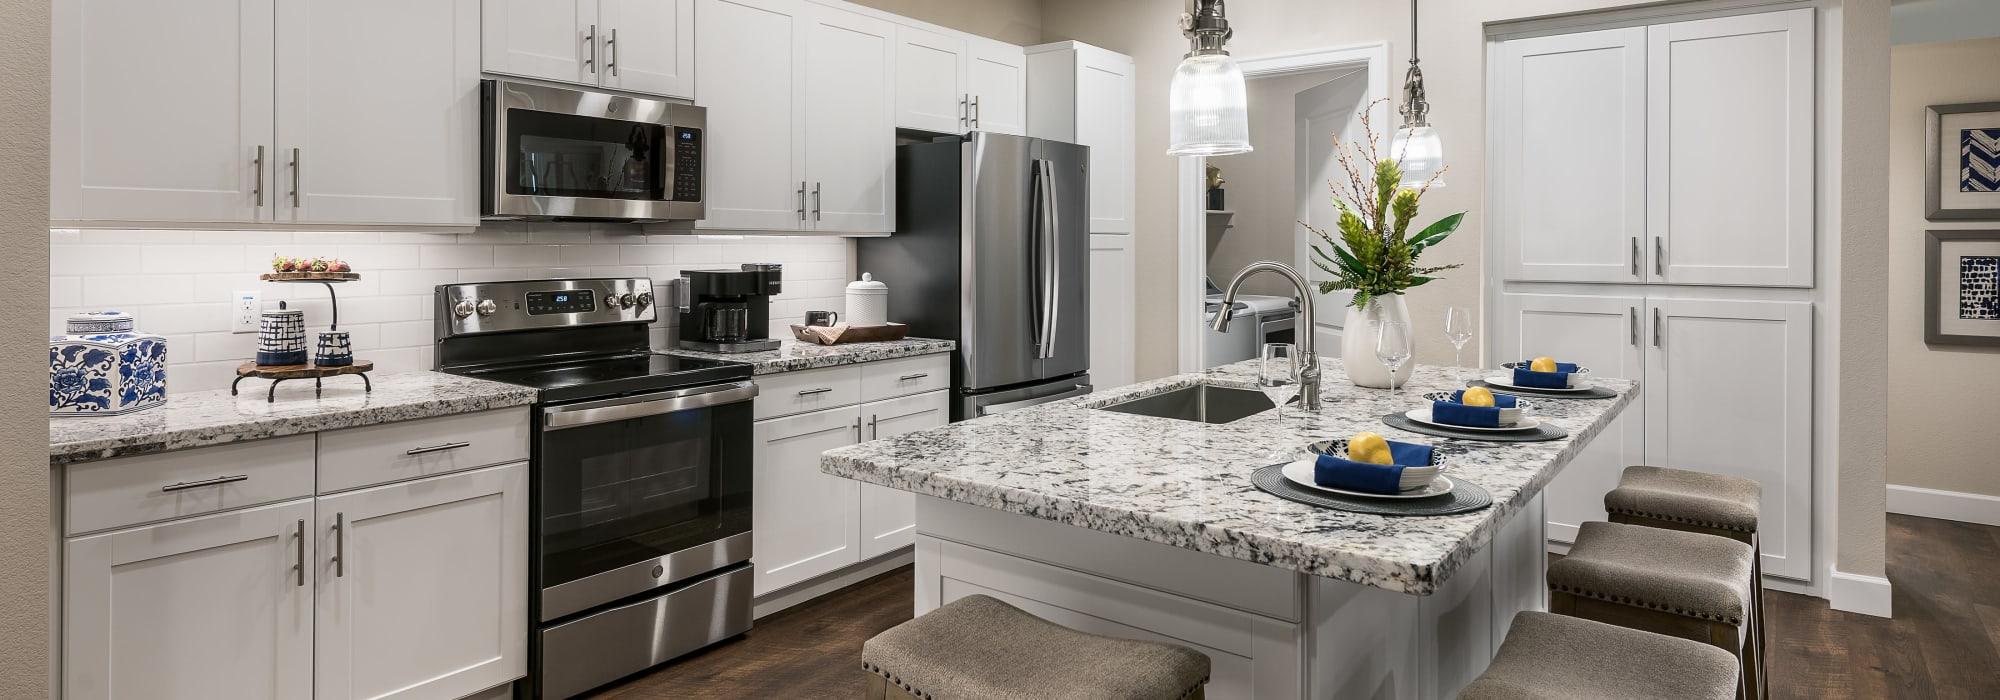 Modern kitchen with stainless steel appliances at San Artes in Scottsdale, Arizona